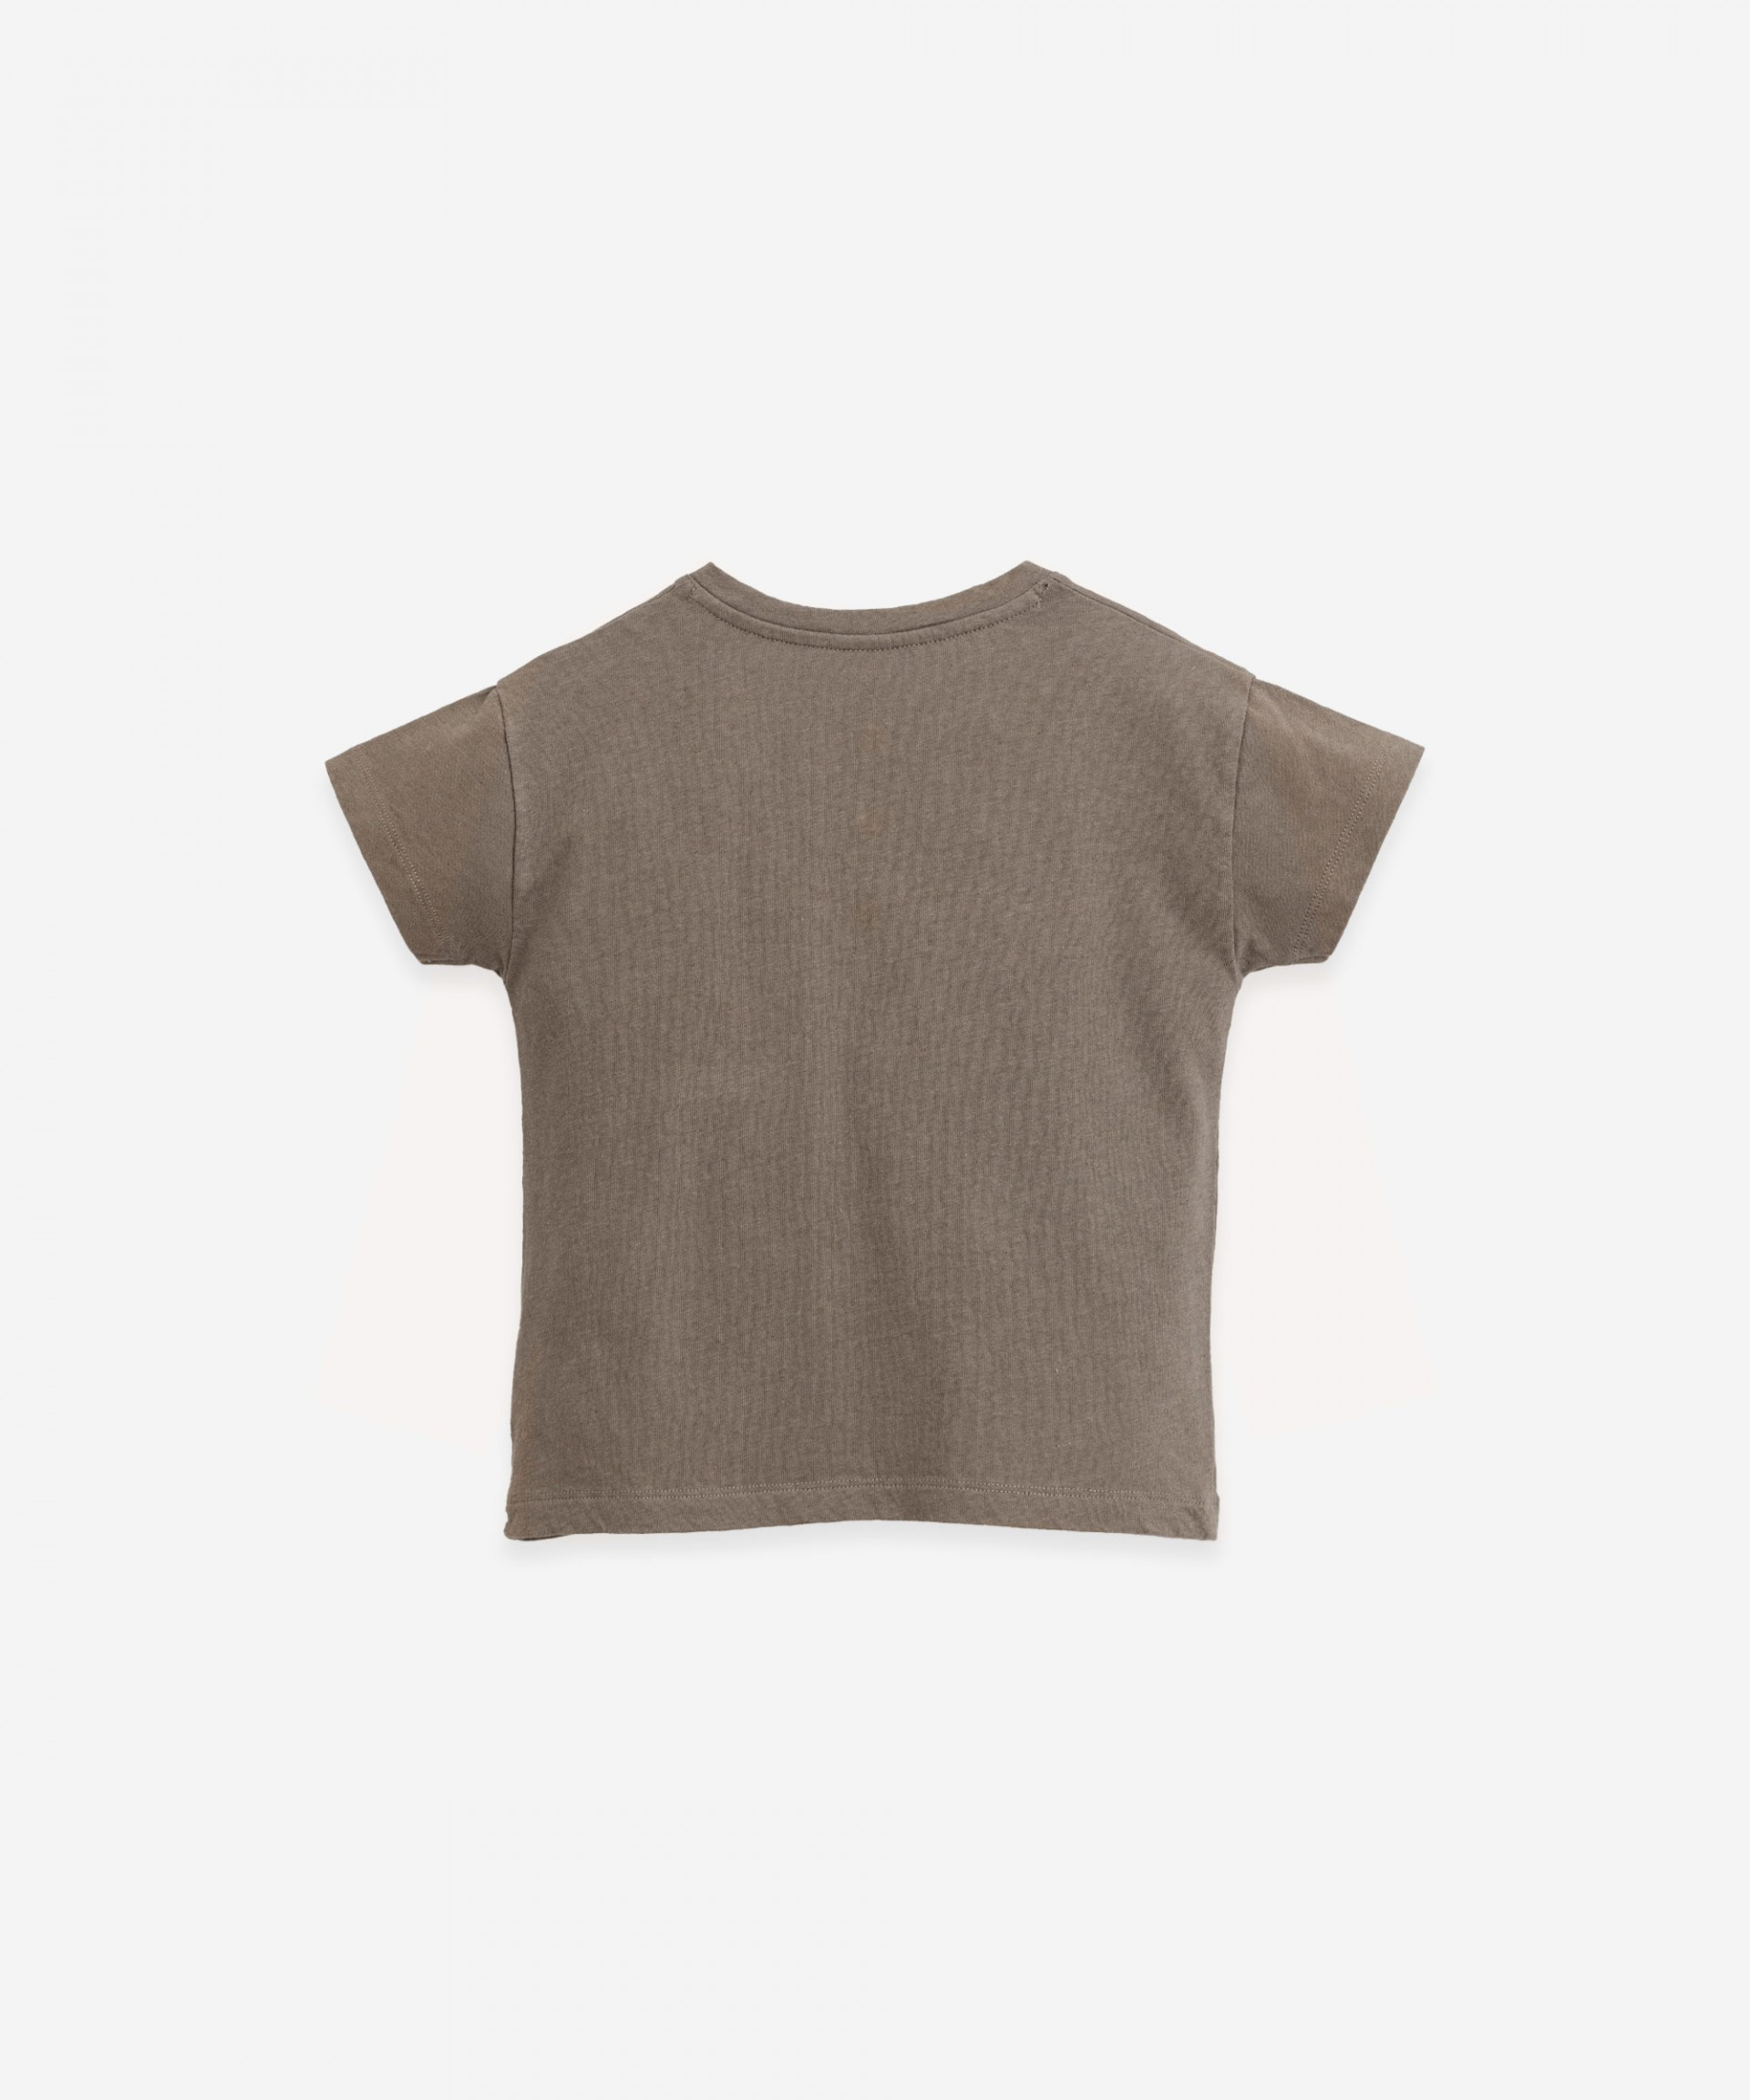 Camiseta con bolsillo | Botany